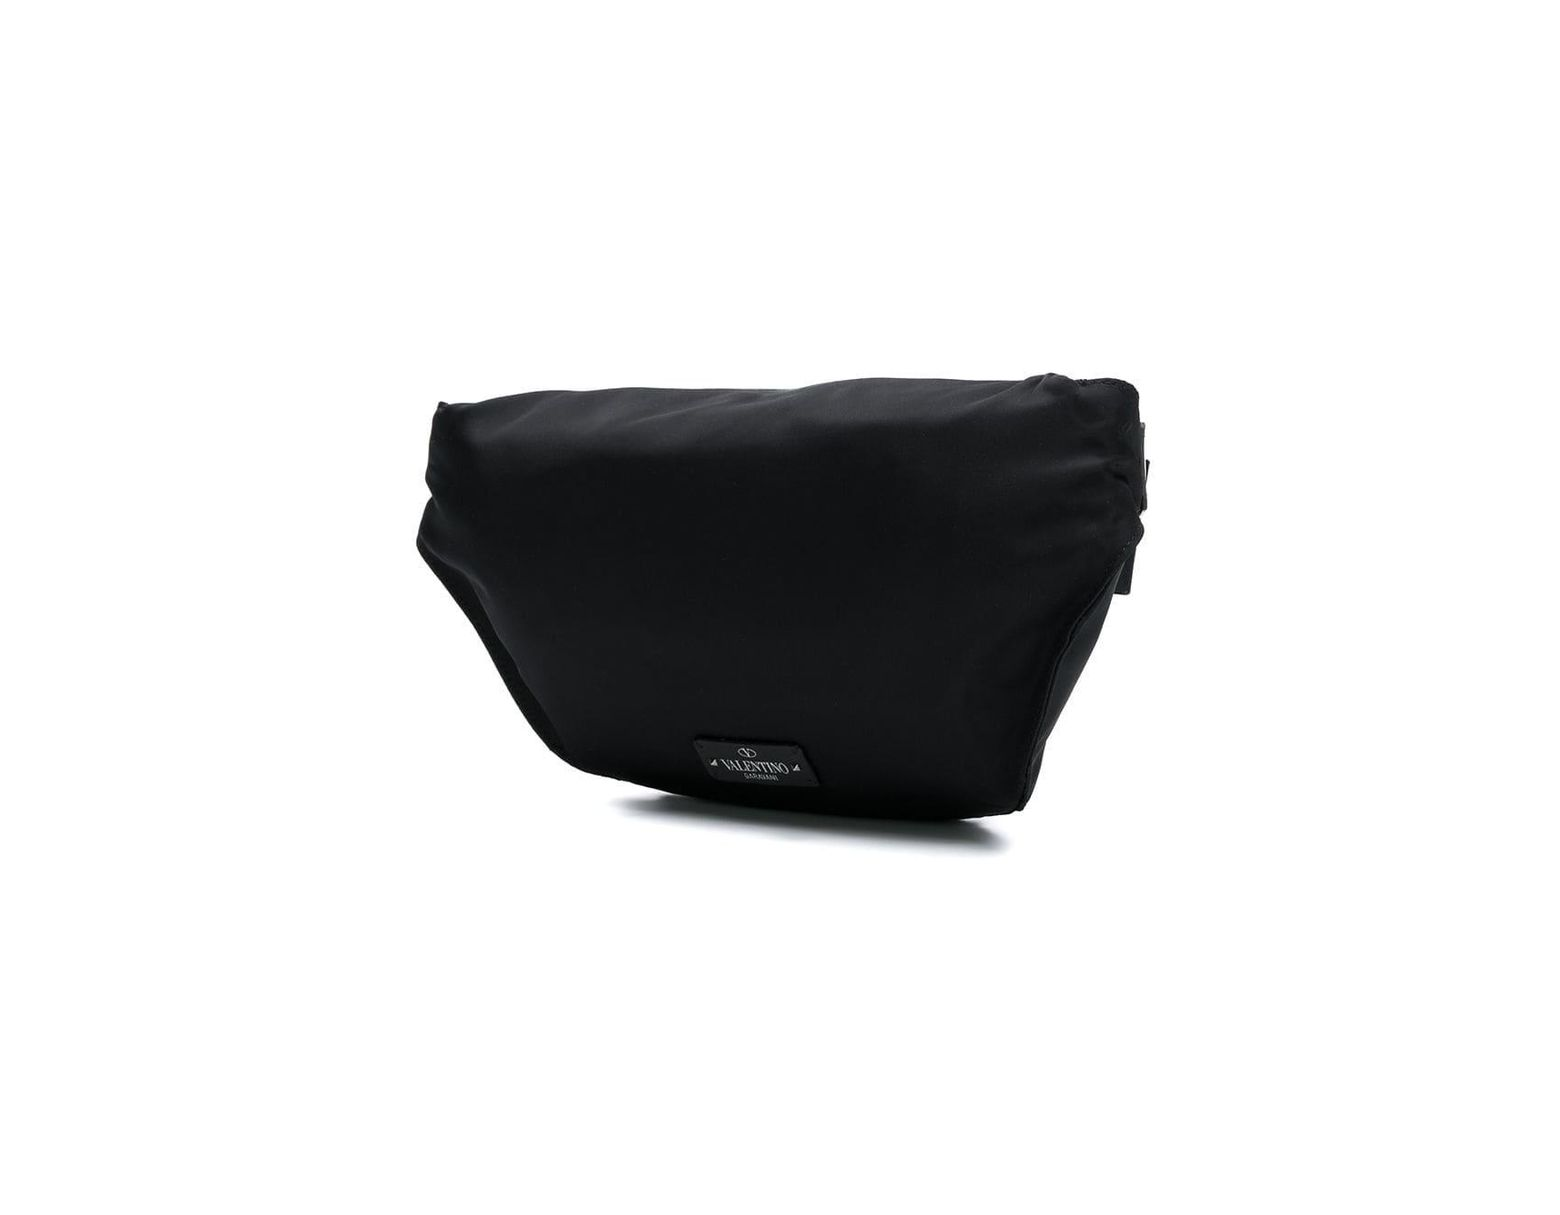 e2958add351a5 Valentino Garavani Vltn Rockstud Belt Bag in Black for Men - Lyst